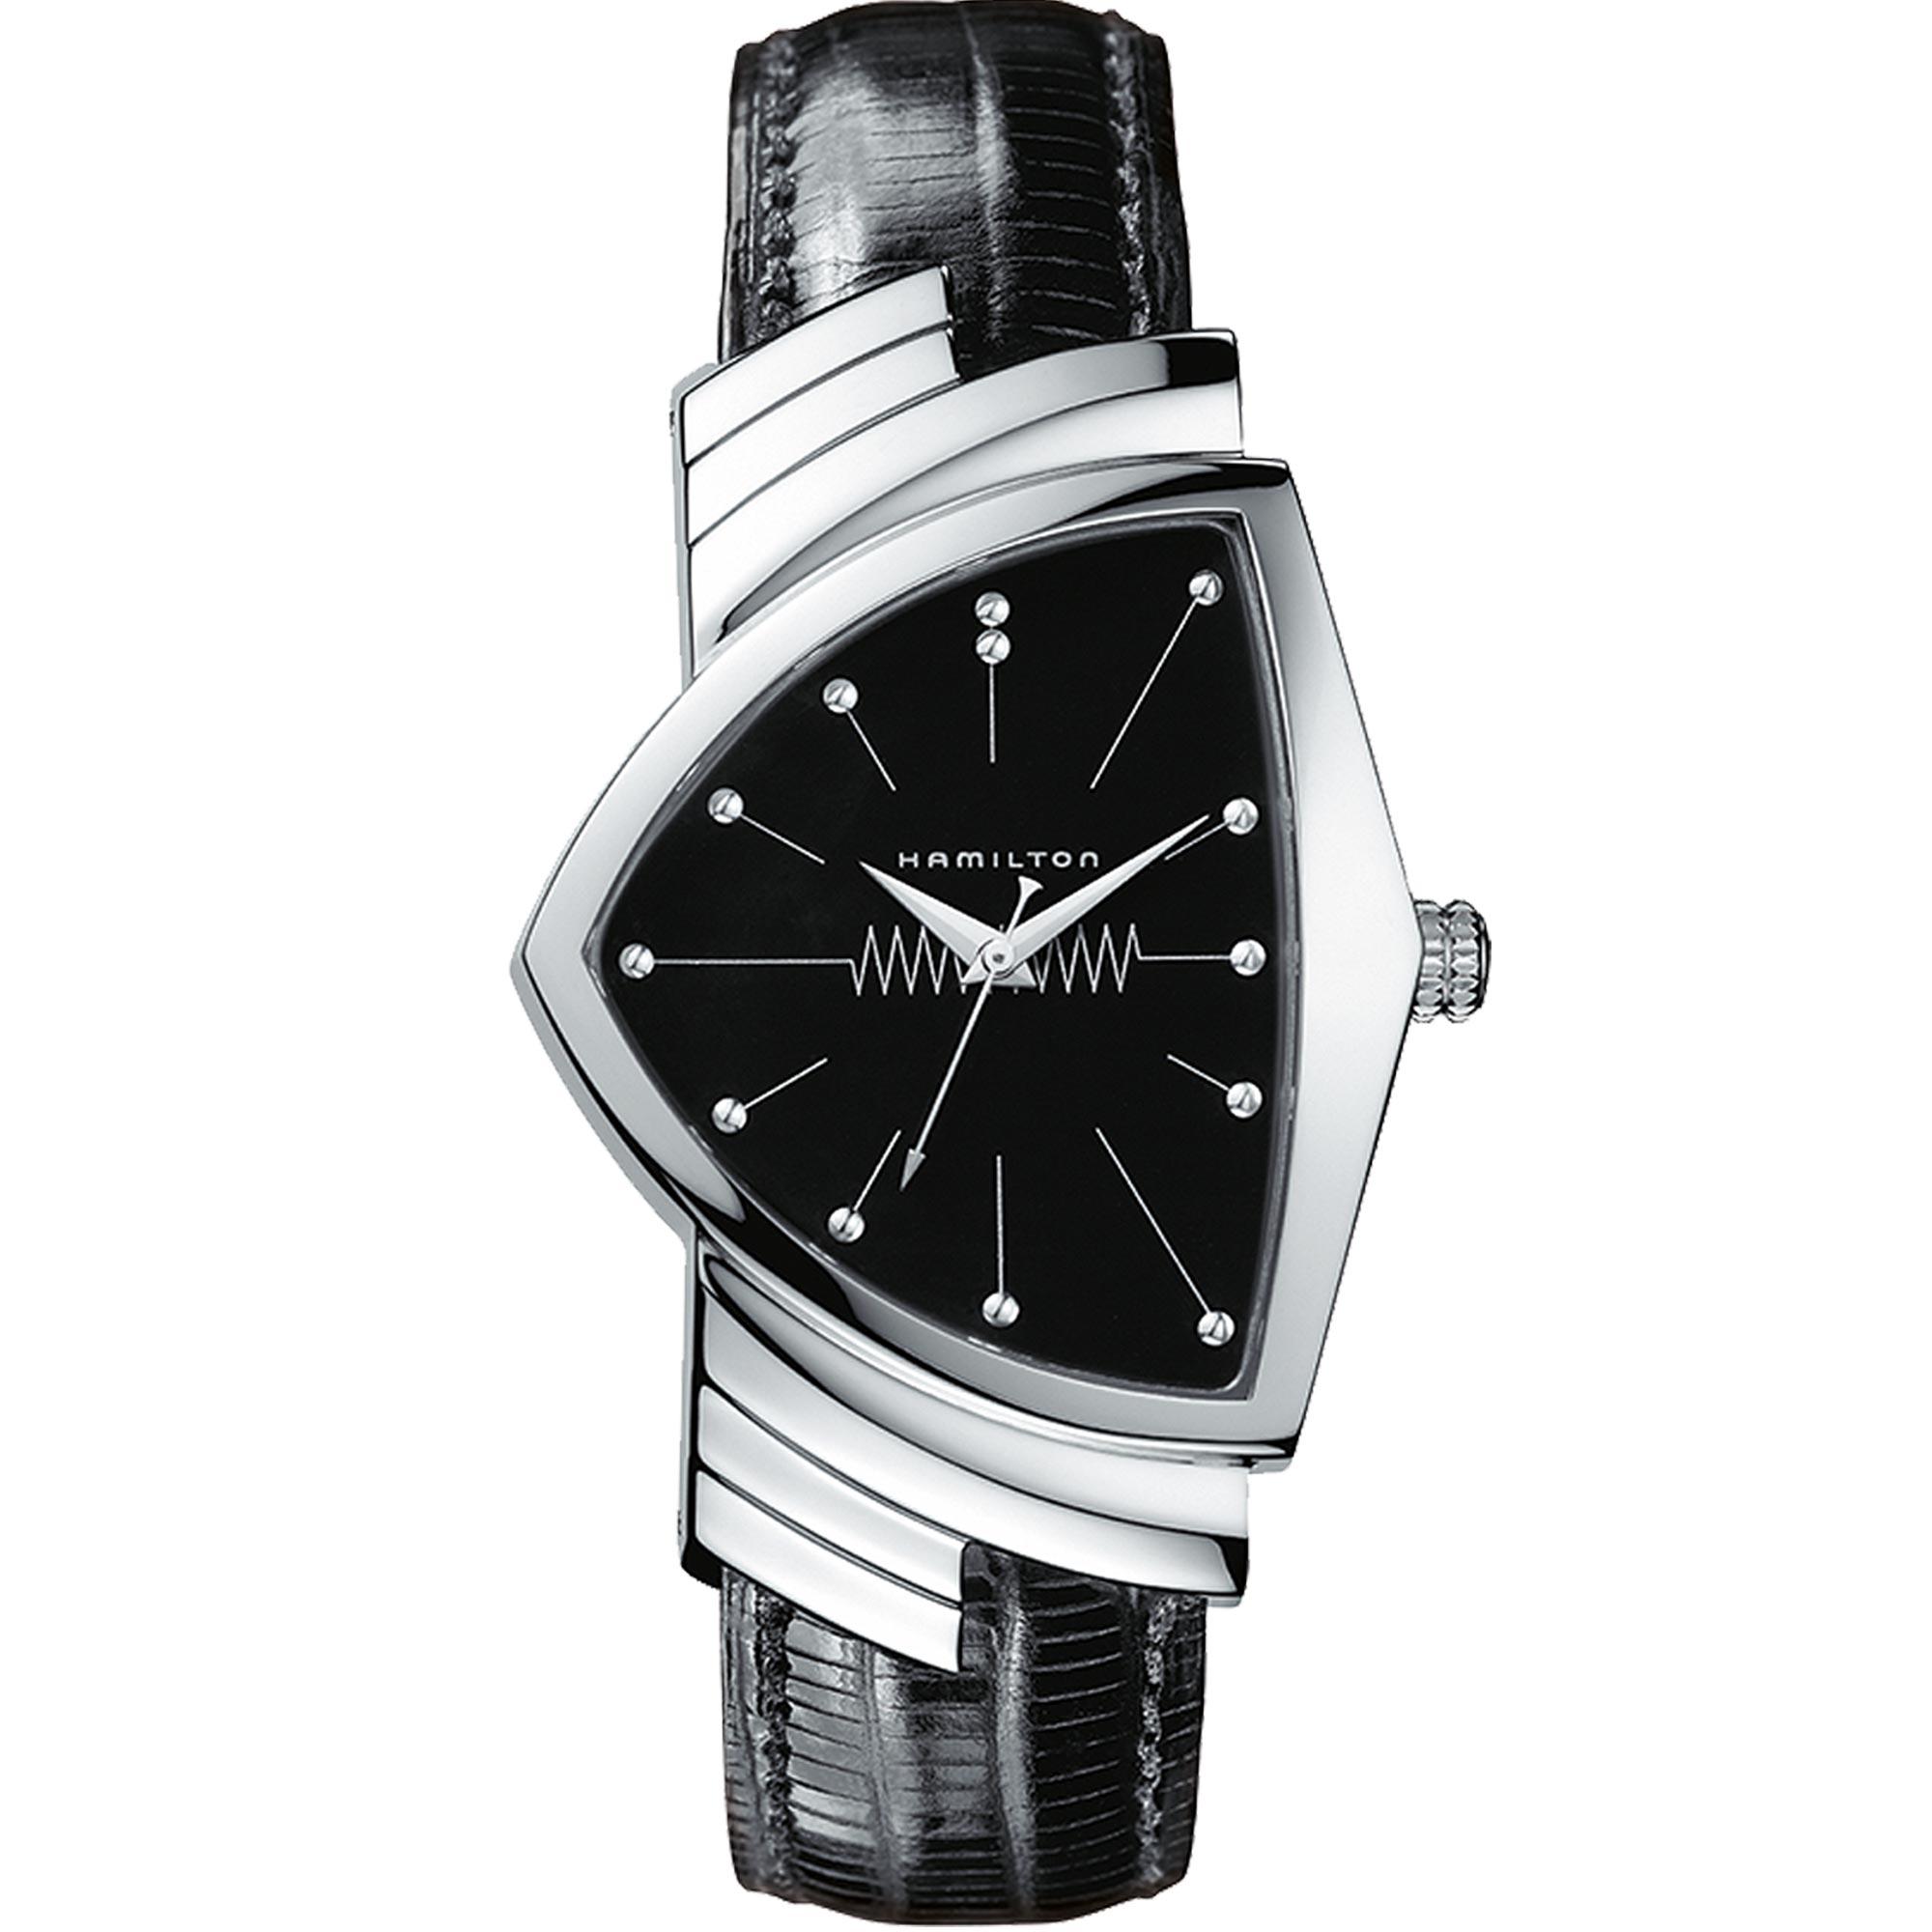 Hamilton Ventura 1957 Recreation 'Men In Black' Quartz Black Dial Leather Strap Men's Watch H24411732 RRP £690